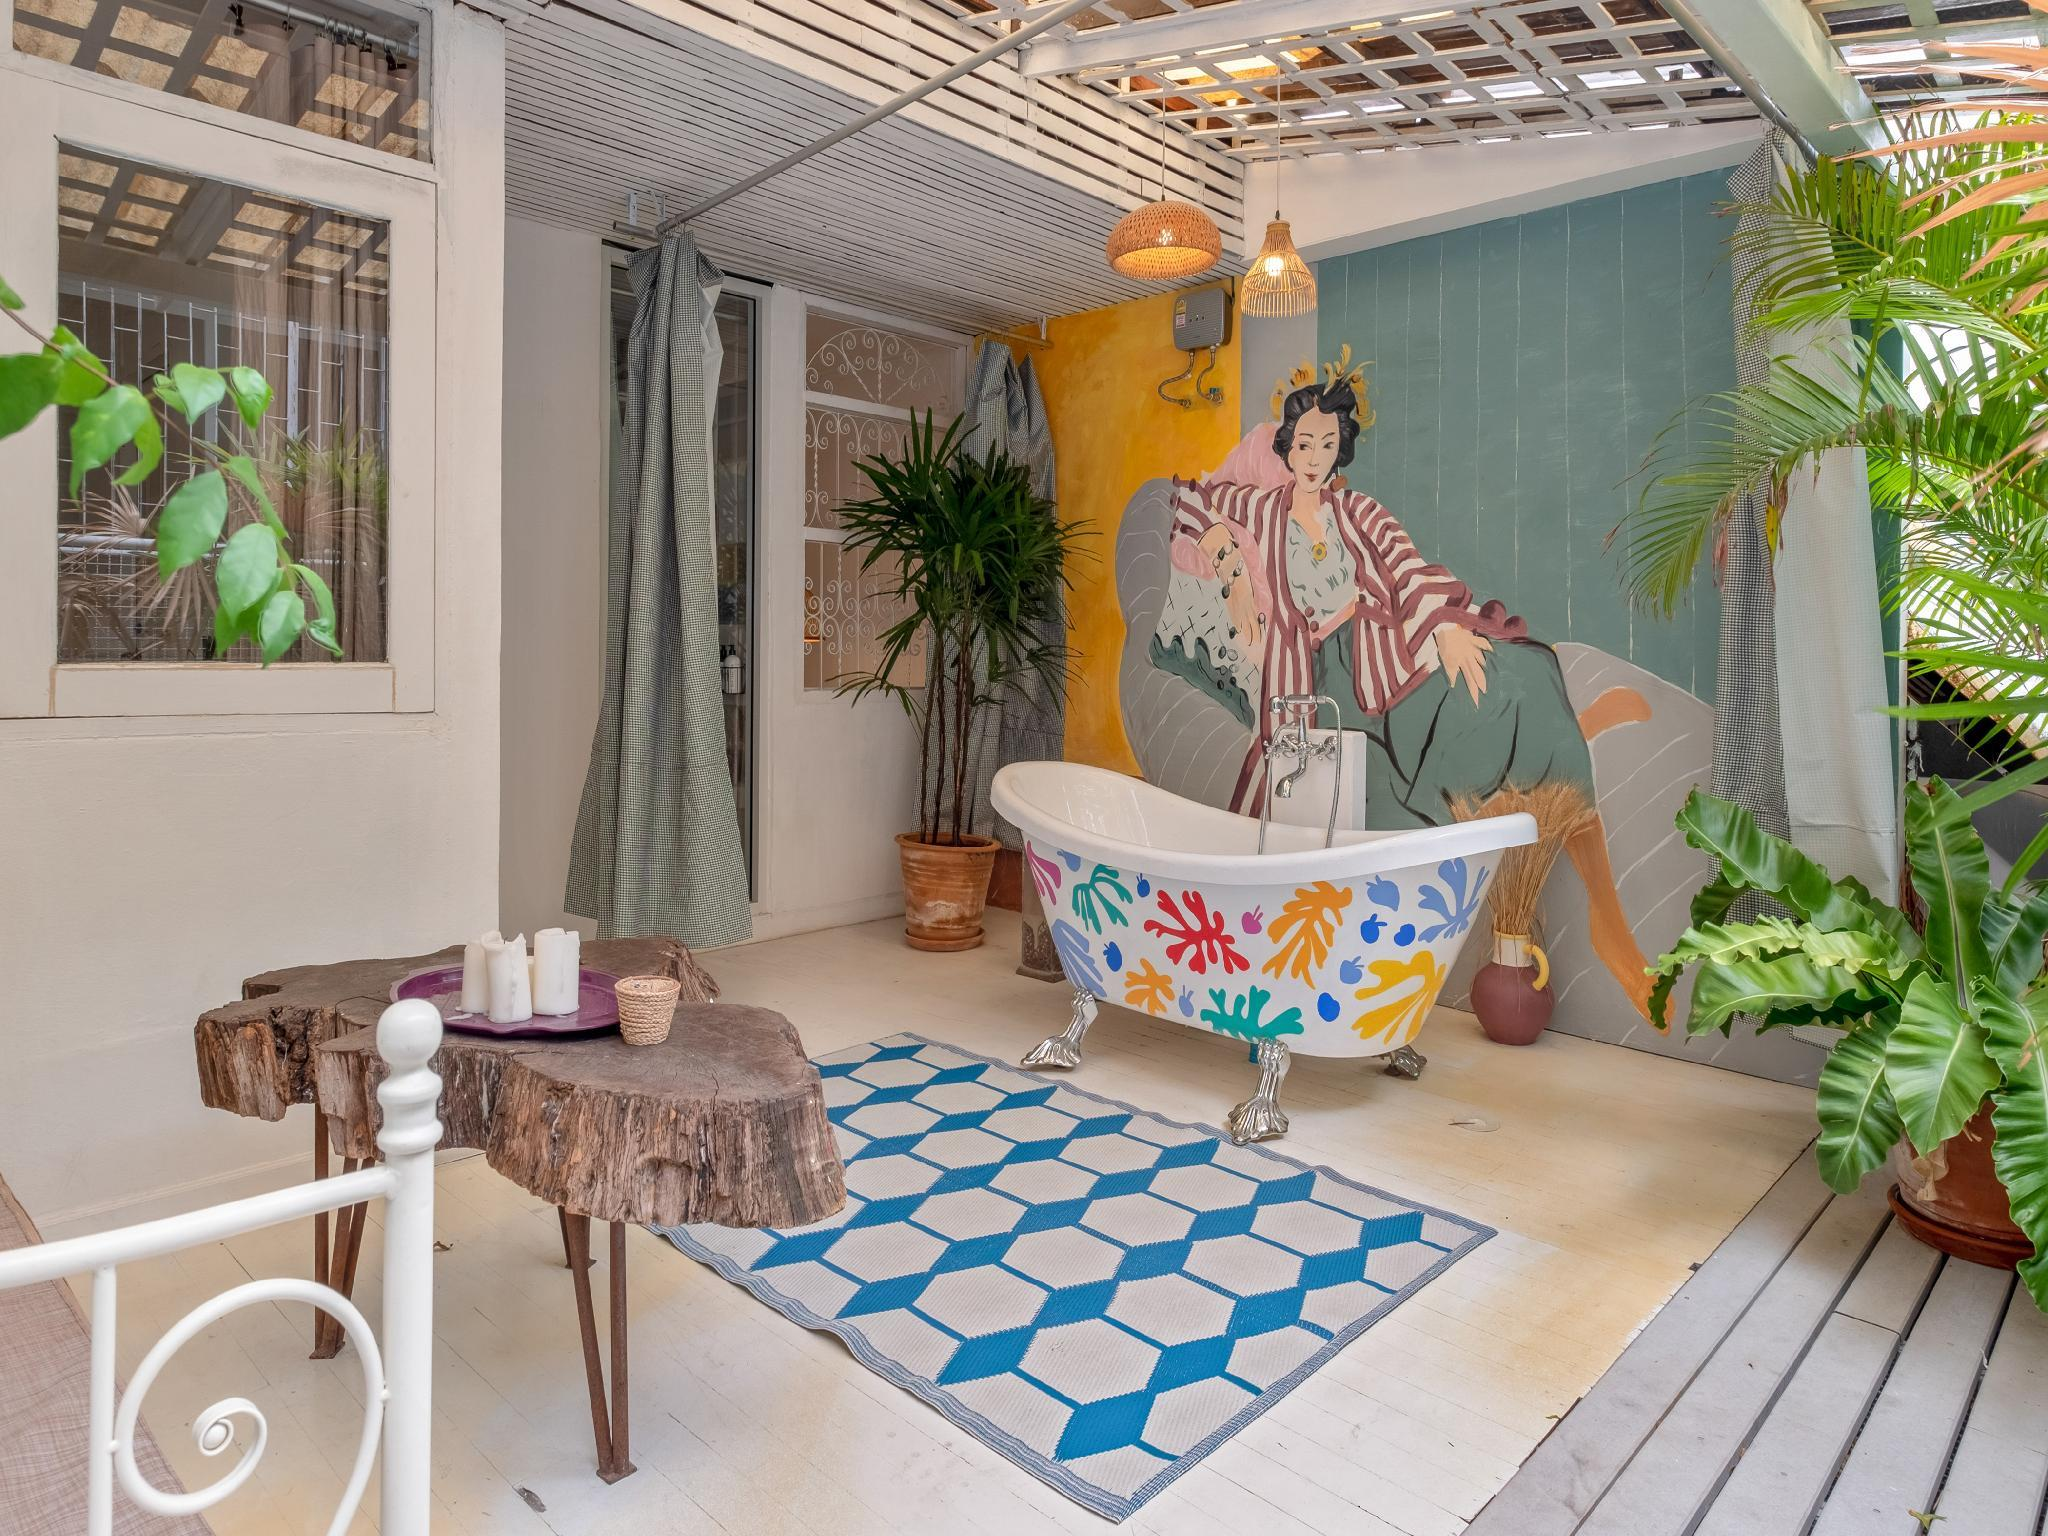 Boho Chic 3 Bedroom In The Center Of BKK